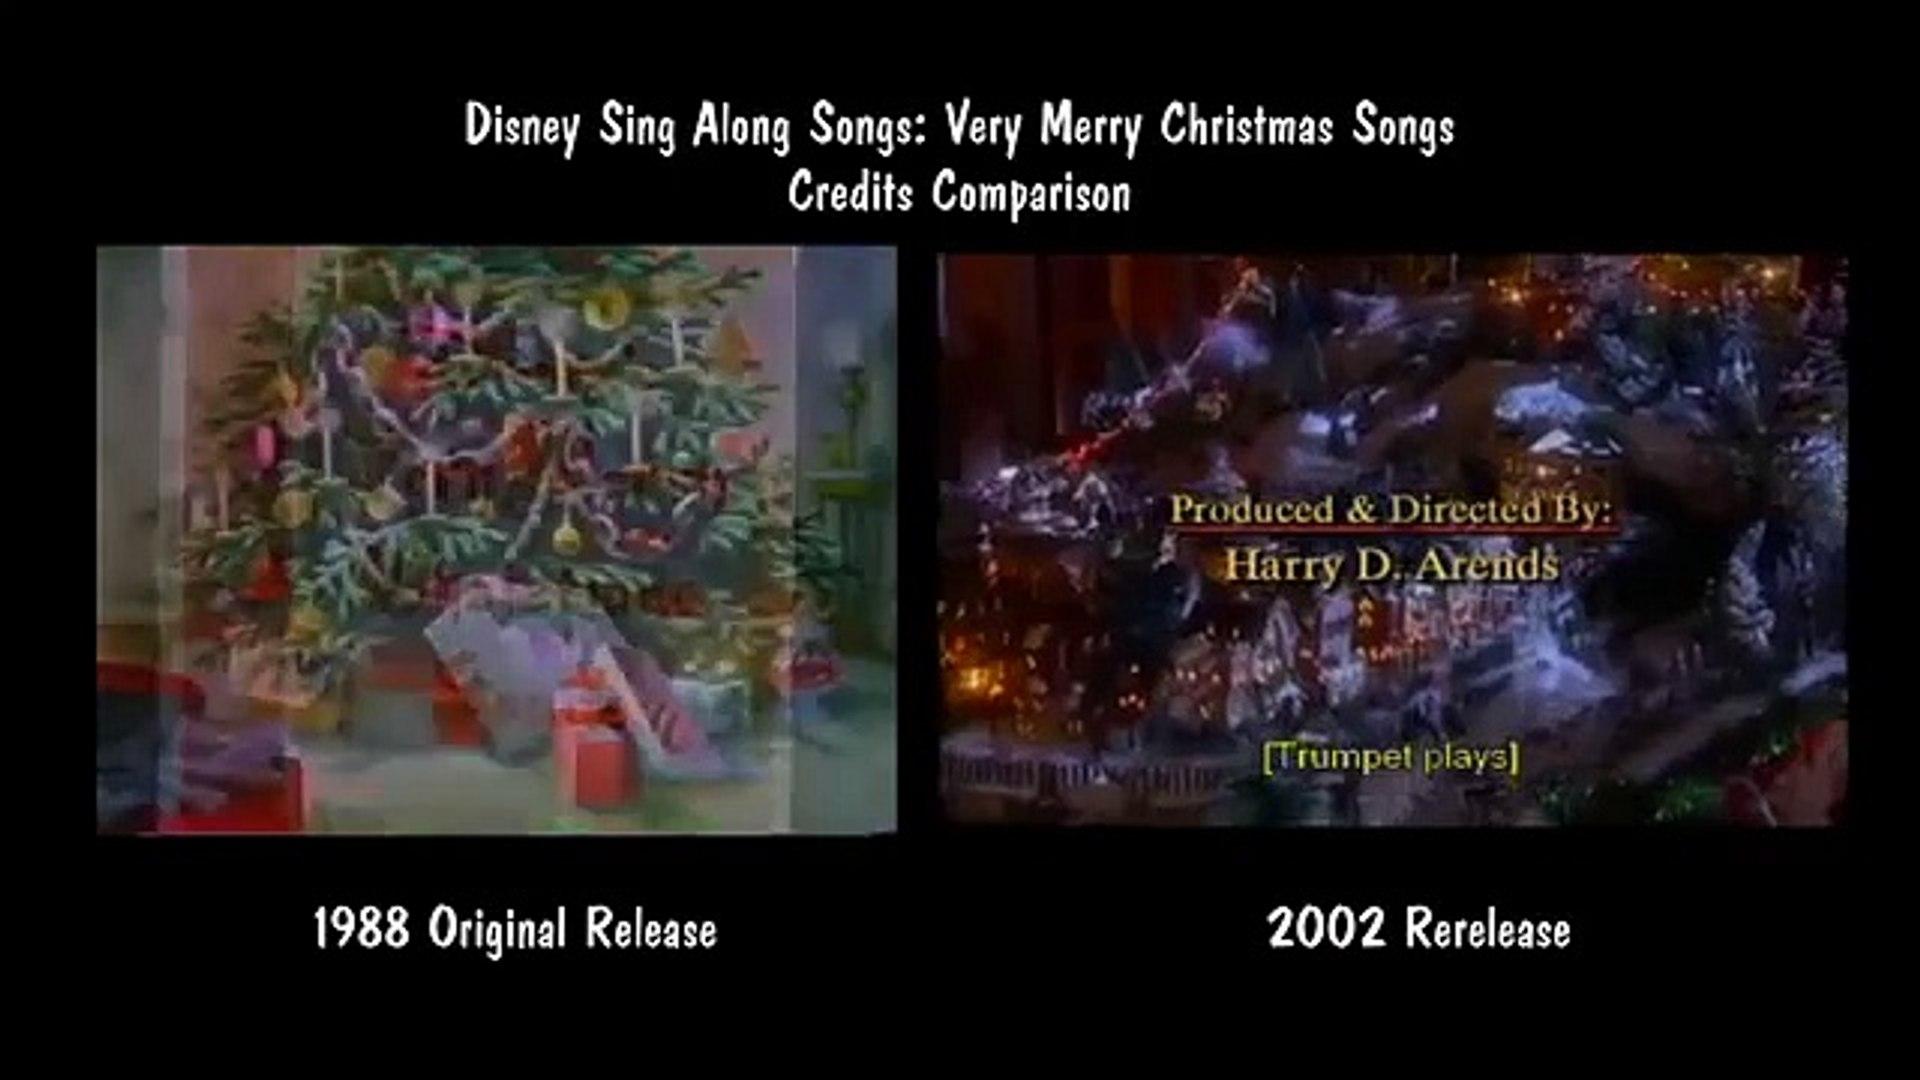 Disney Sing Along Songs Christmas Vhs.Disney Sing Along Songs Very Merry Christmas Songs Credits Comparison